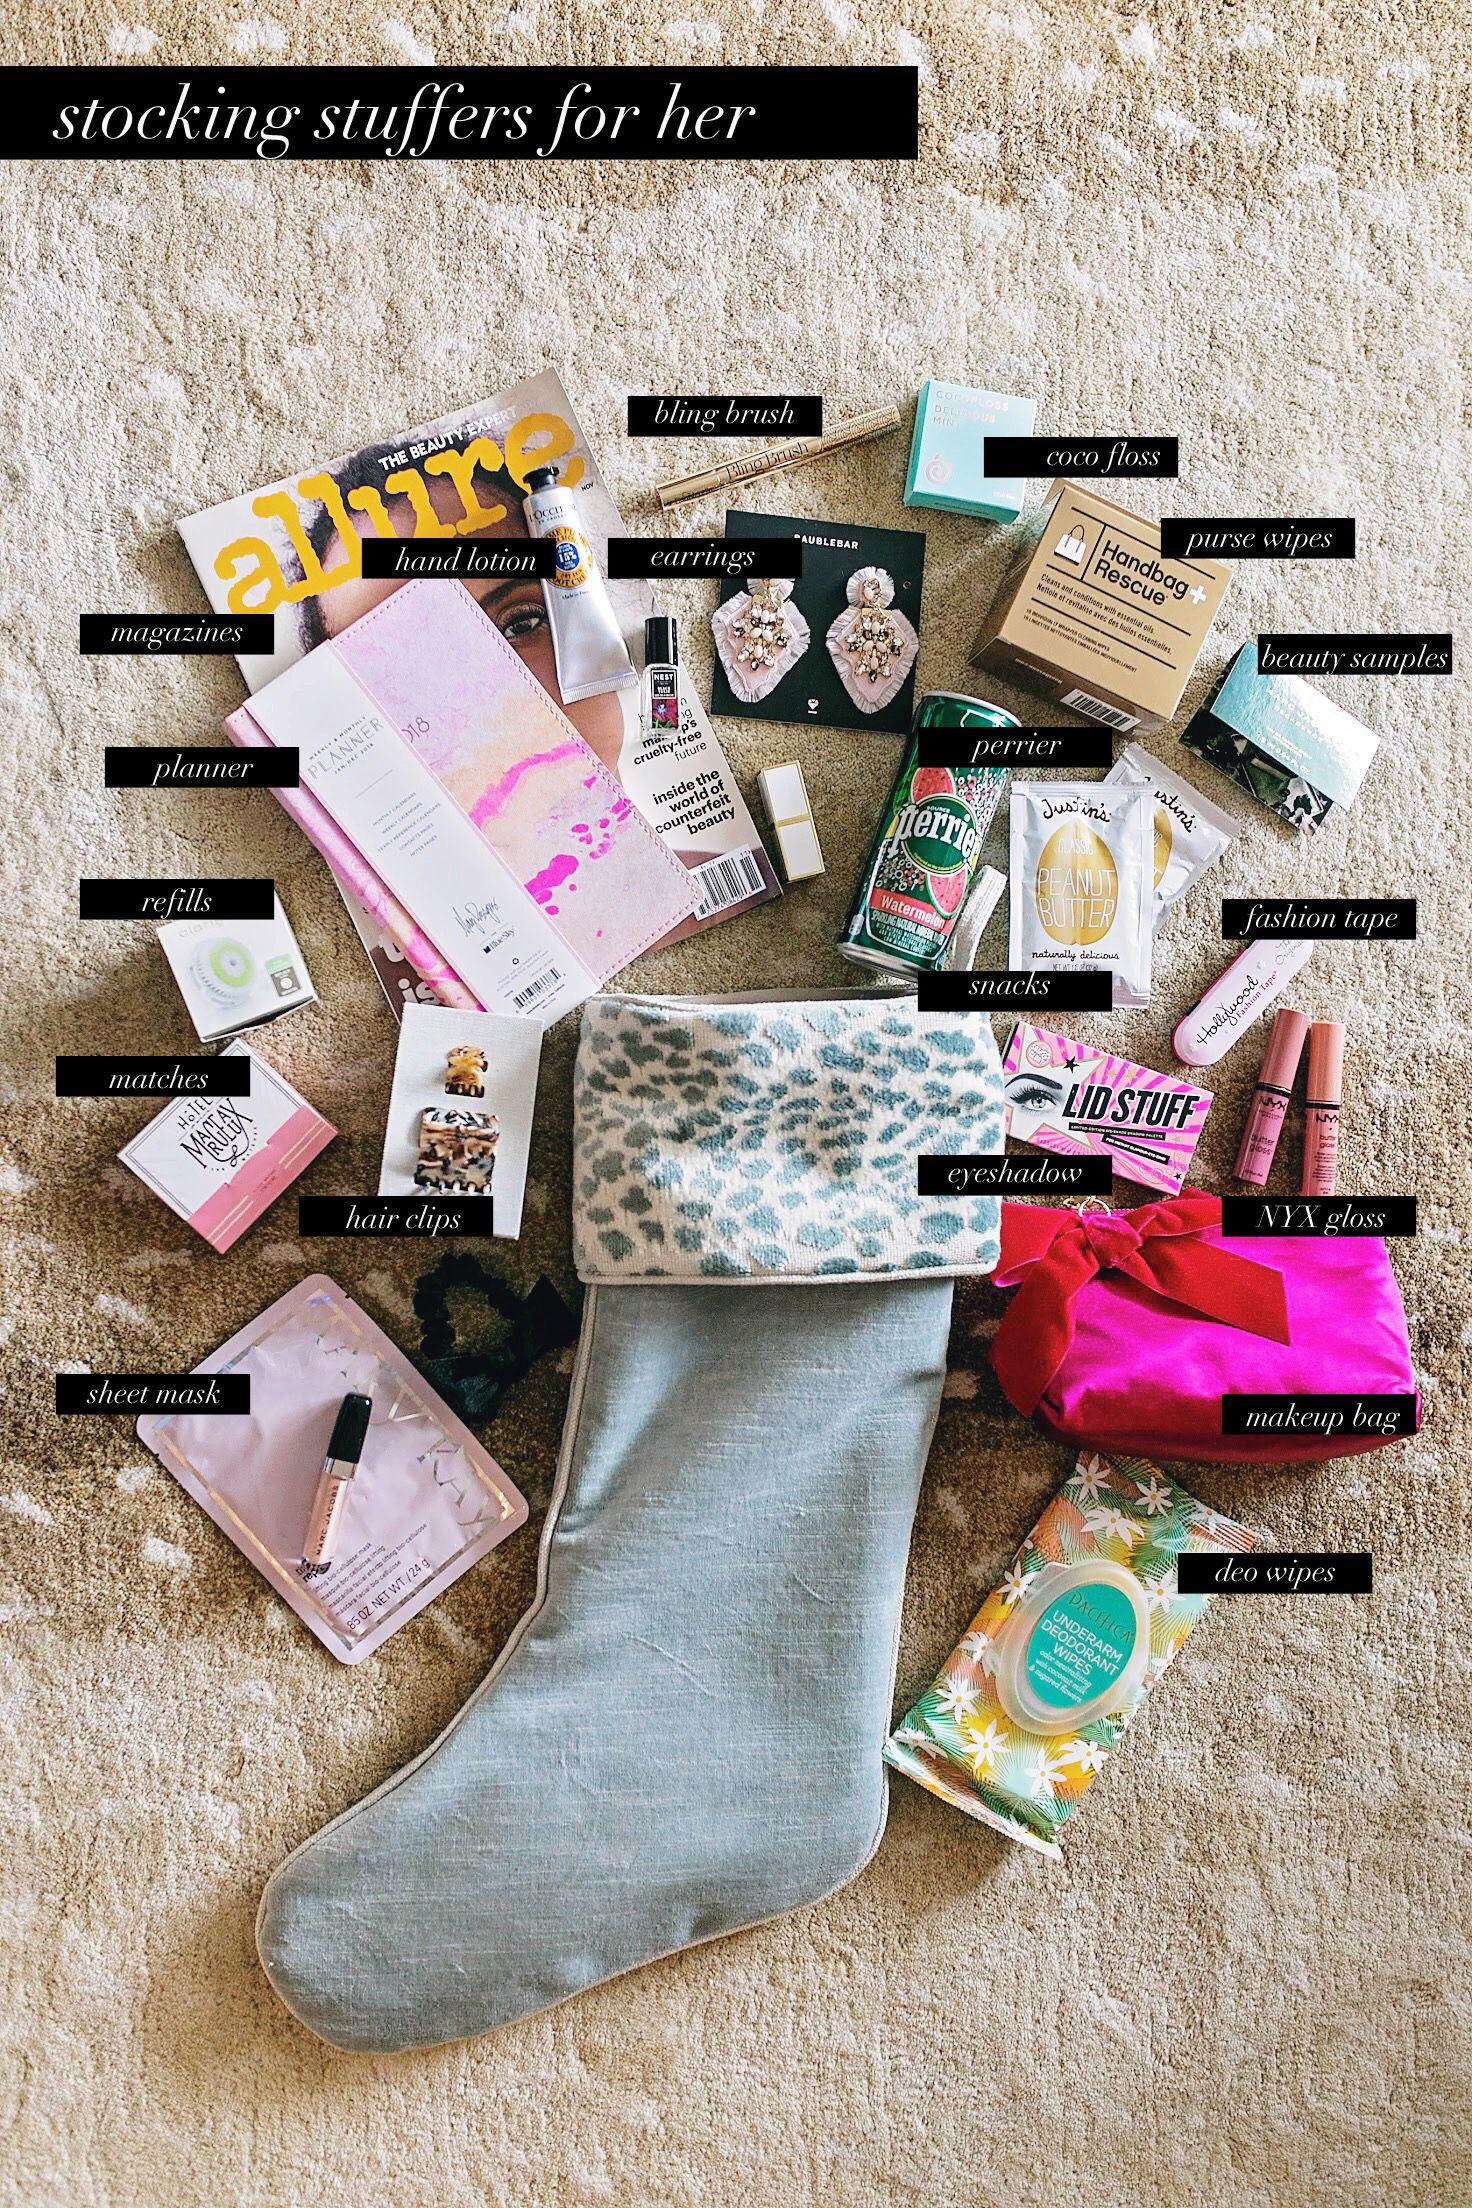 COF stocking stuffers for her 2017 #giftguide #stockingstuffersformen